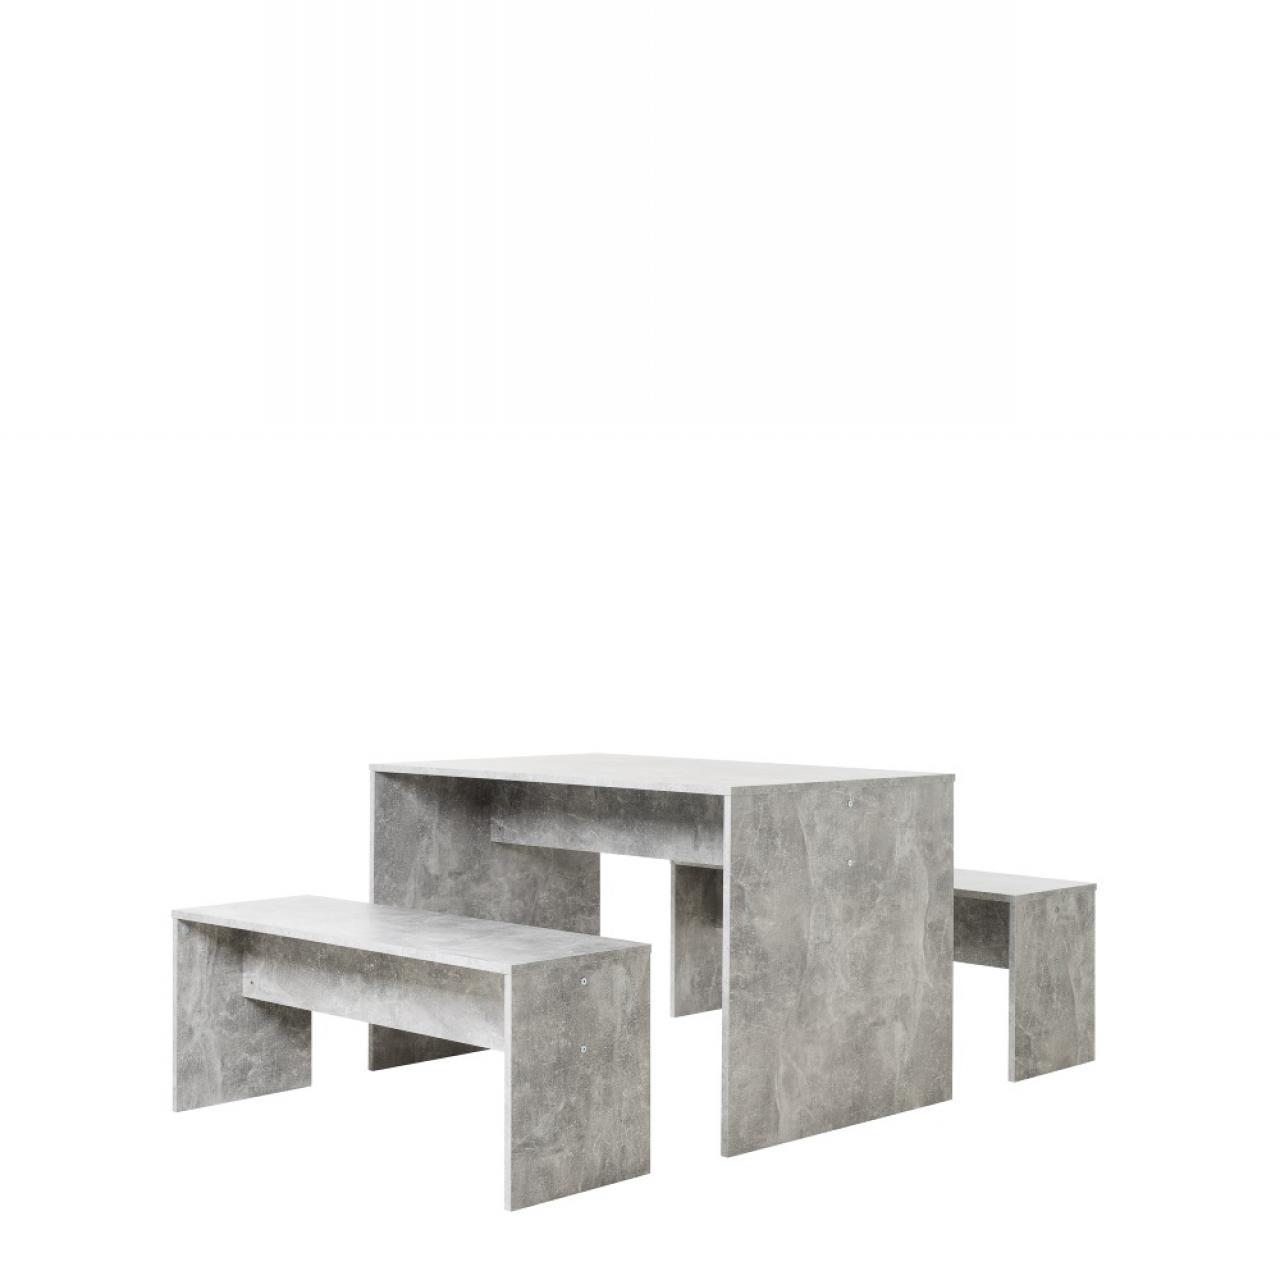 Tischgruppe - Berlin - Strukturbeton Nachbildung